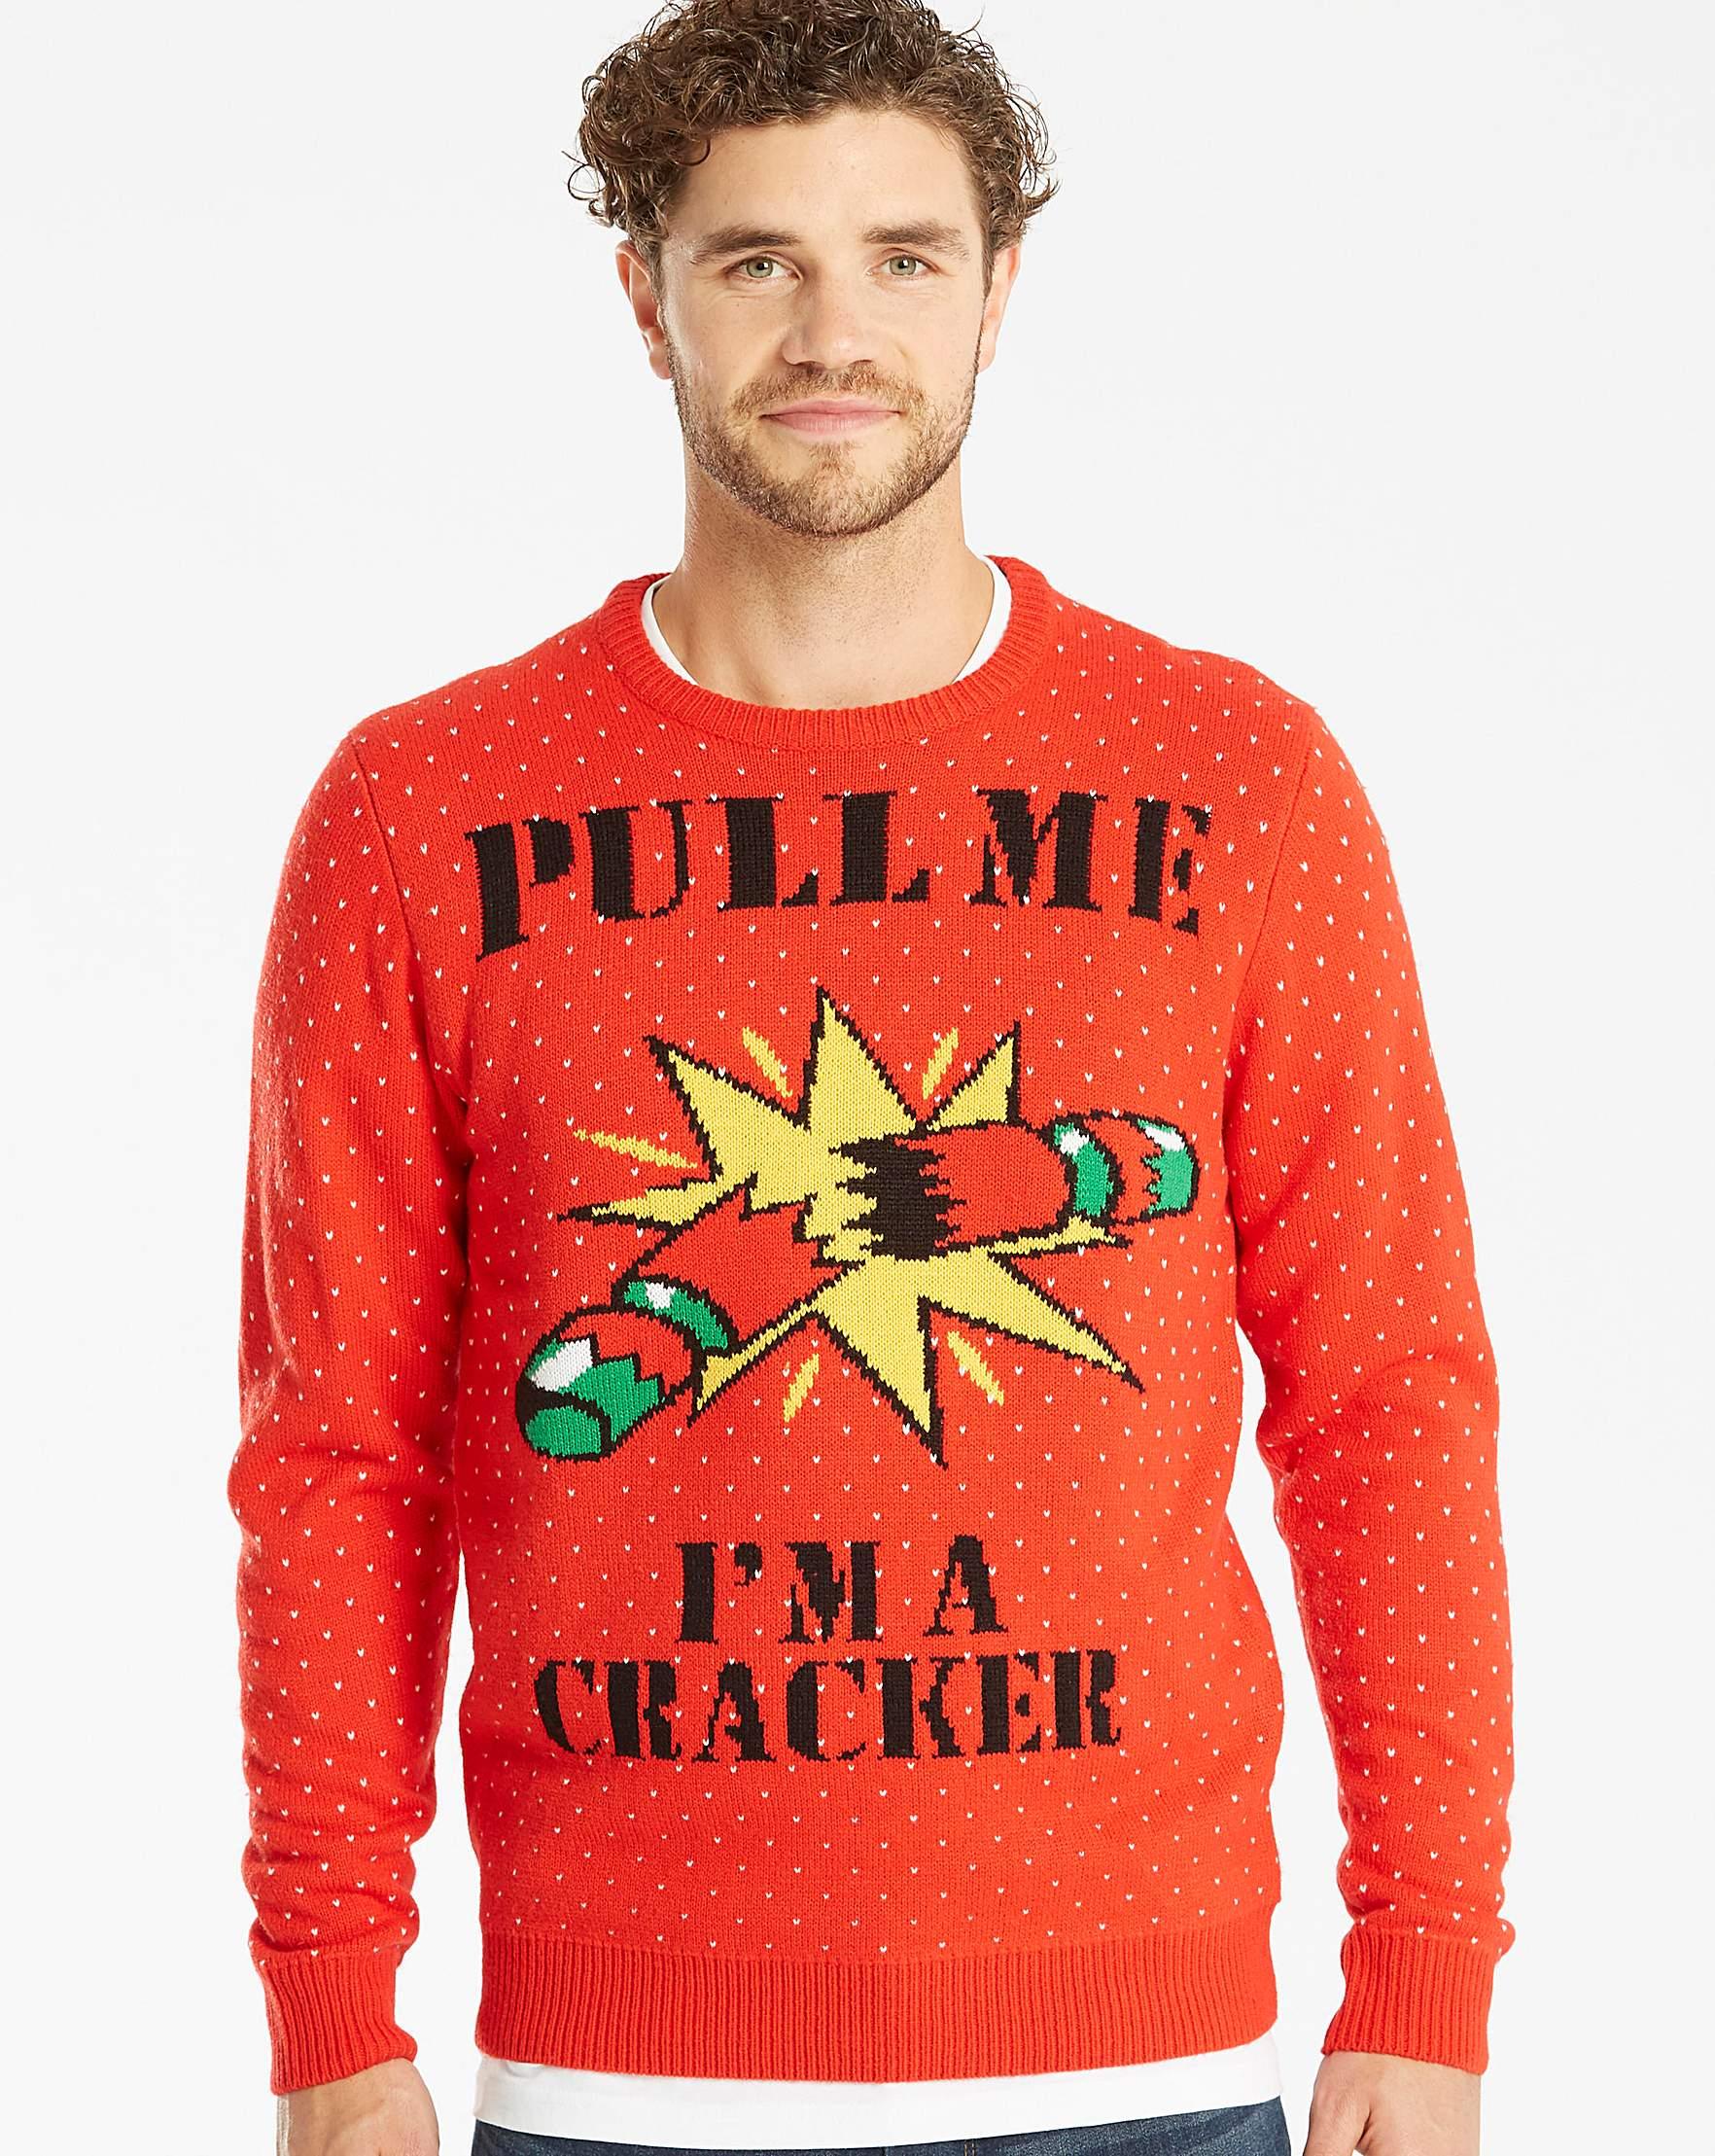 Label Regular Knit J Jacamo Xmas Cracker aUqHafS